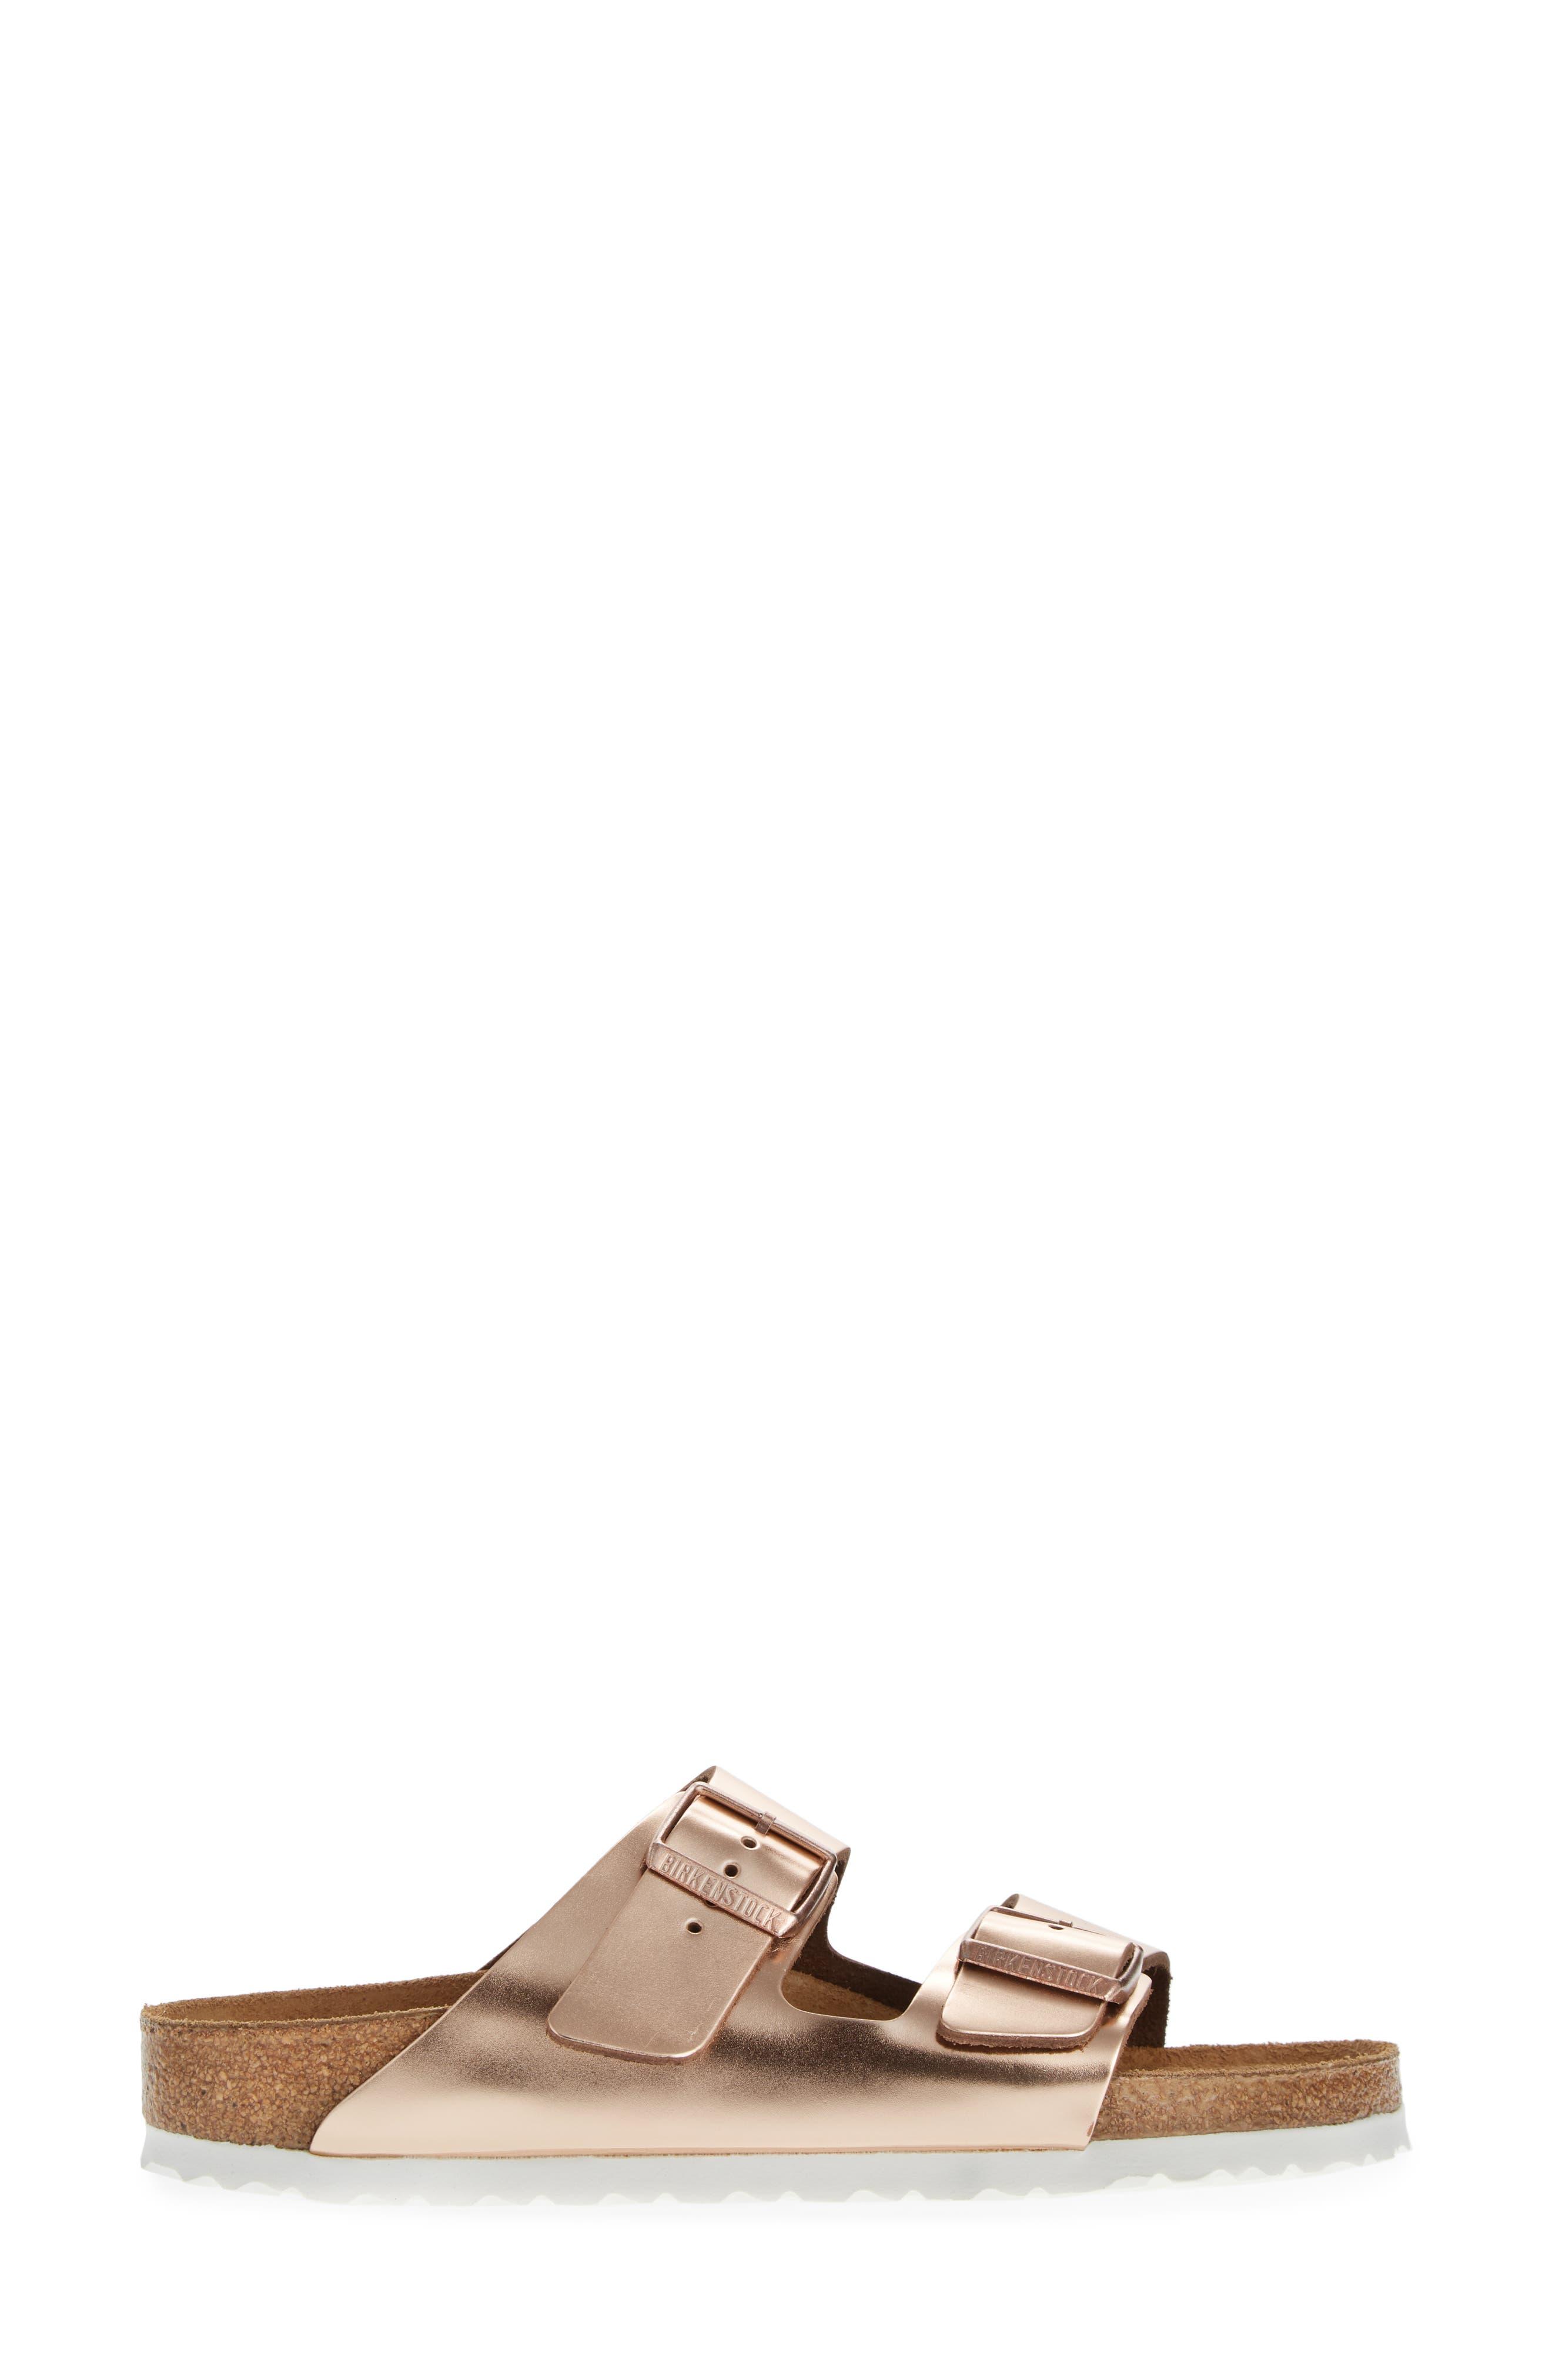 Arizona Soft Footbed Sandal,                             Alternate thumbnail 3, color,                             COPPER LEATHER